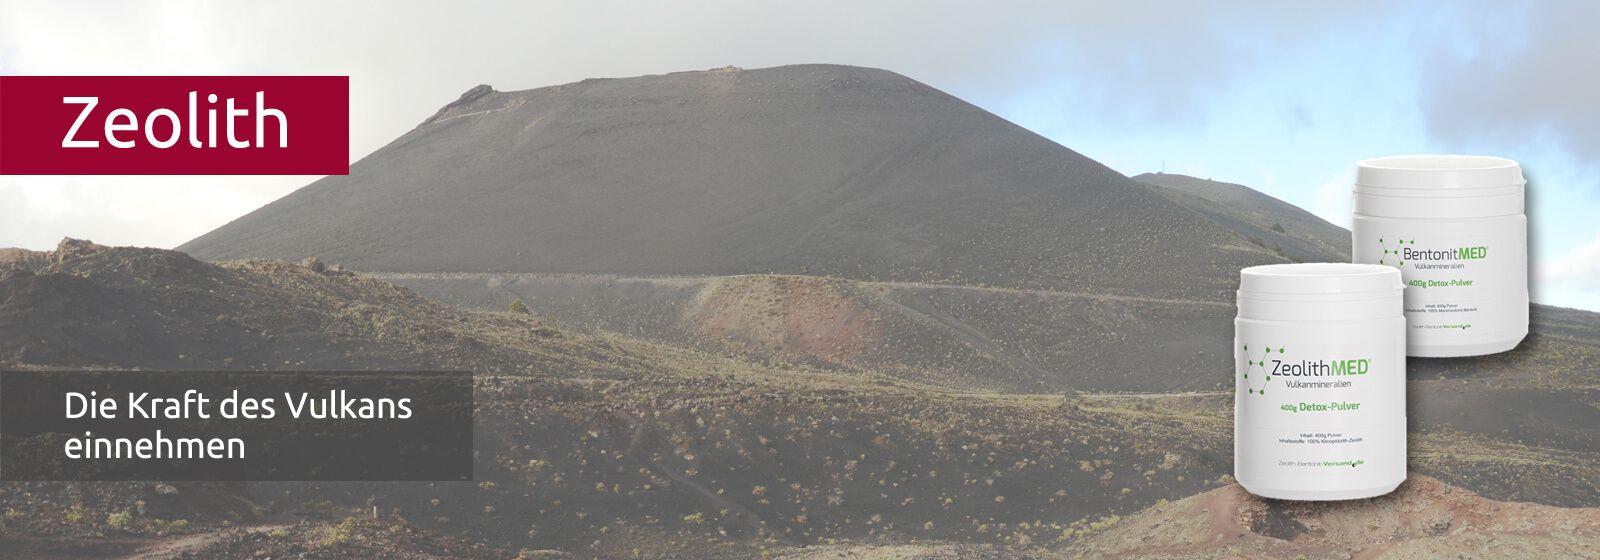 ZeolithMED Heilerde - Detox-Pulver 400g - grauer Vulkanberg